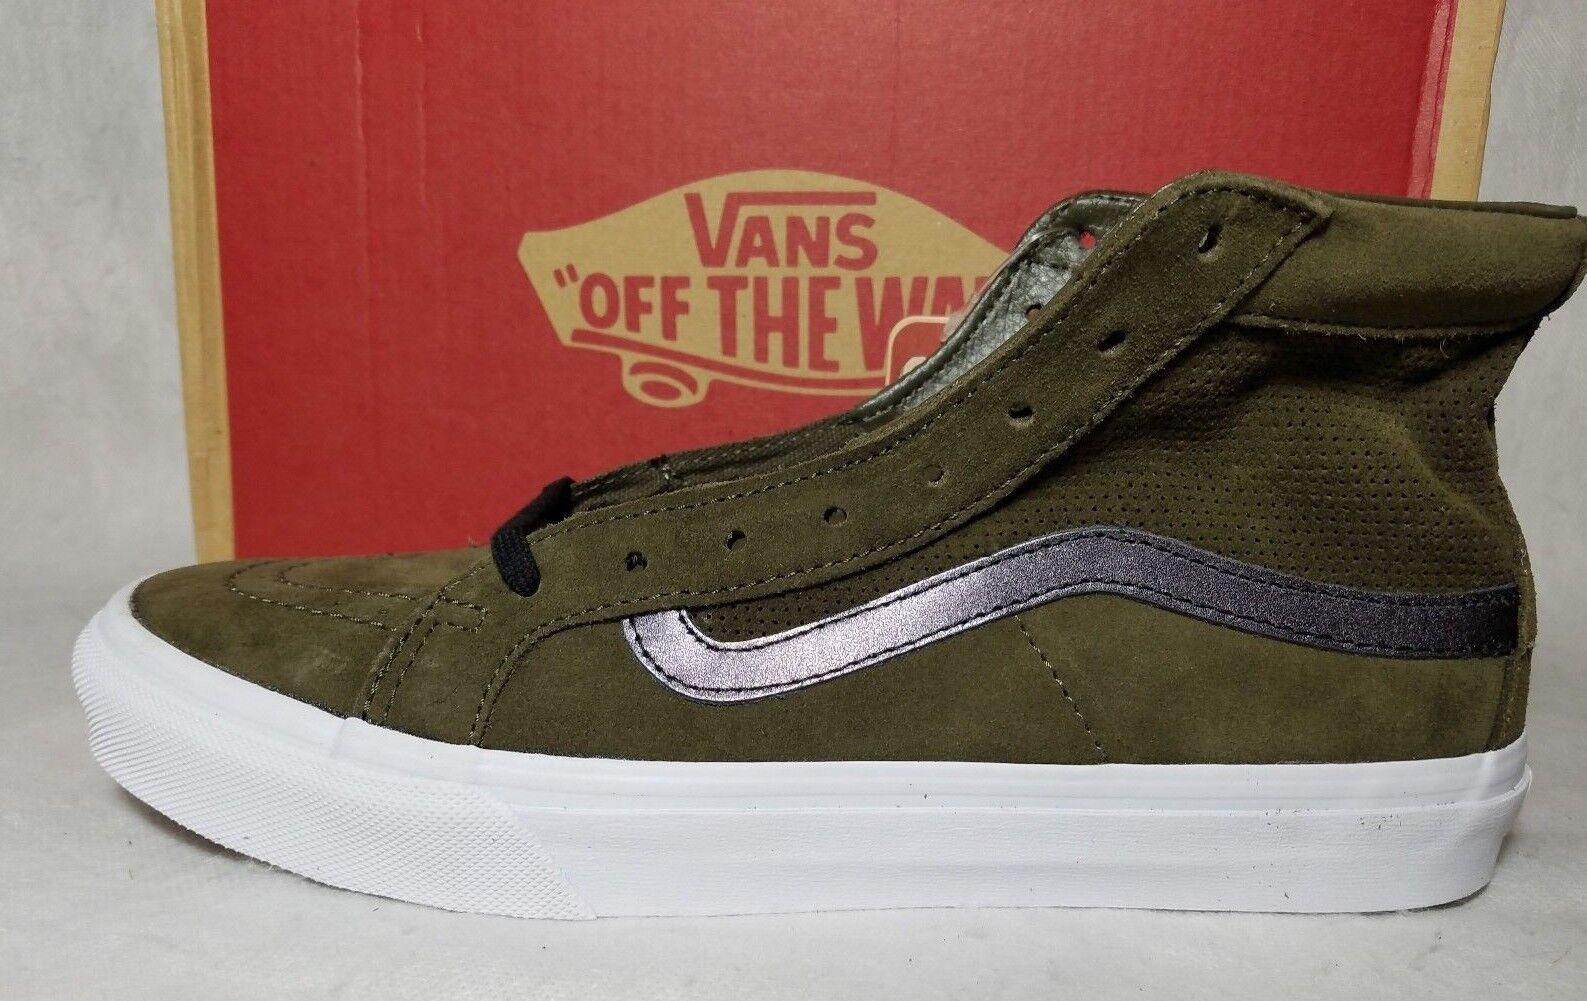 Vans New Sk8 Hi Slim Cutout Perf Green Suede Leather Tarmac White Shoe Women's 6